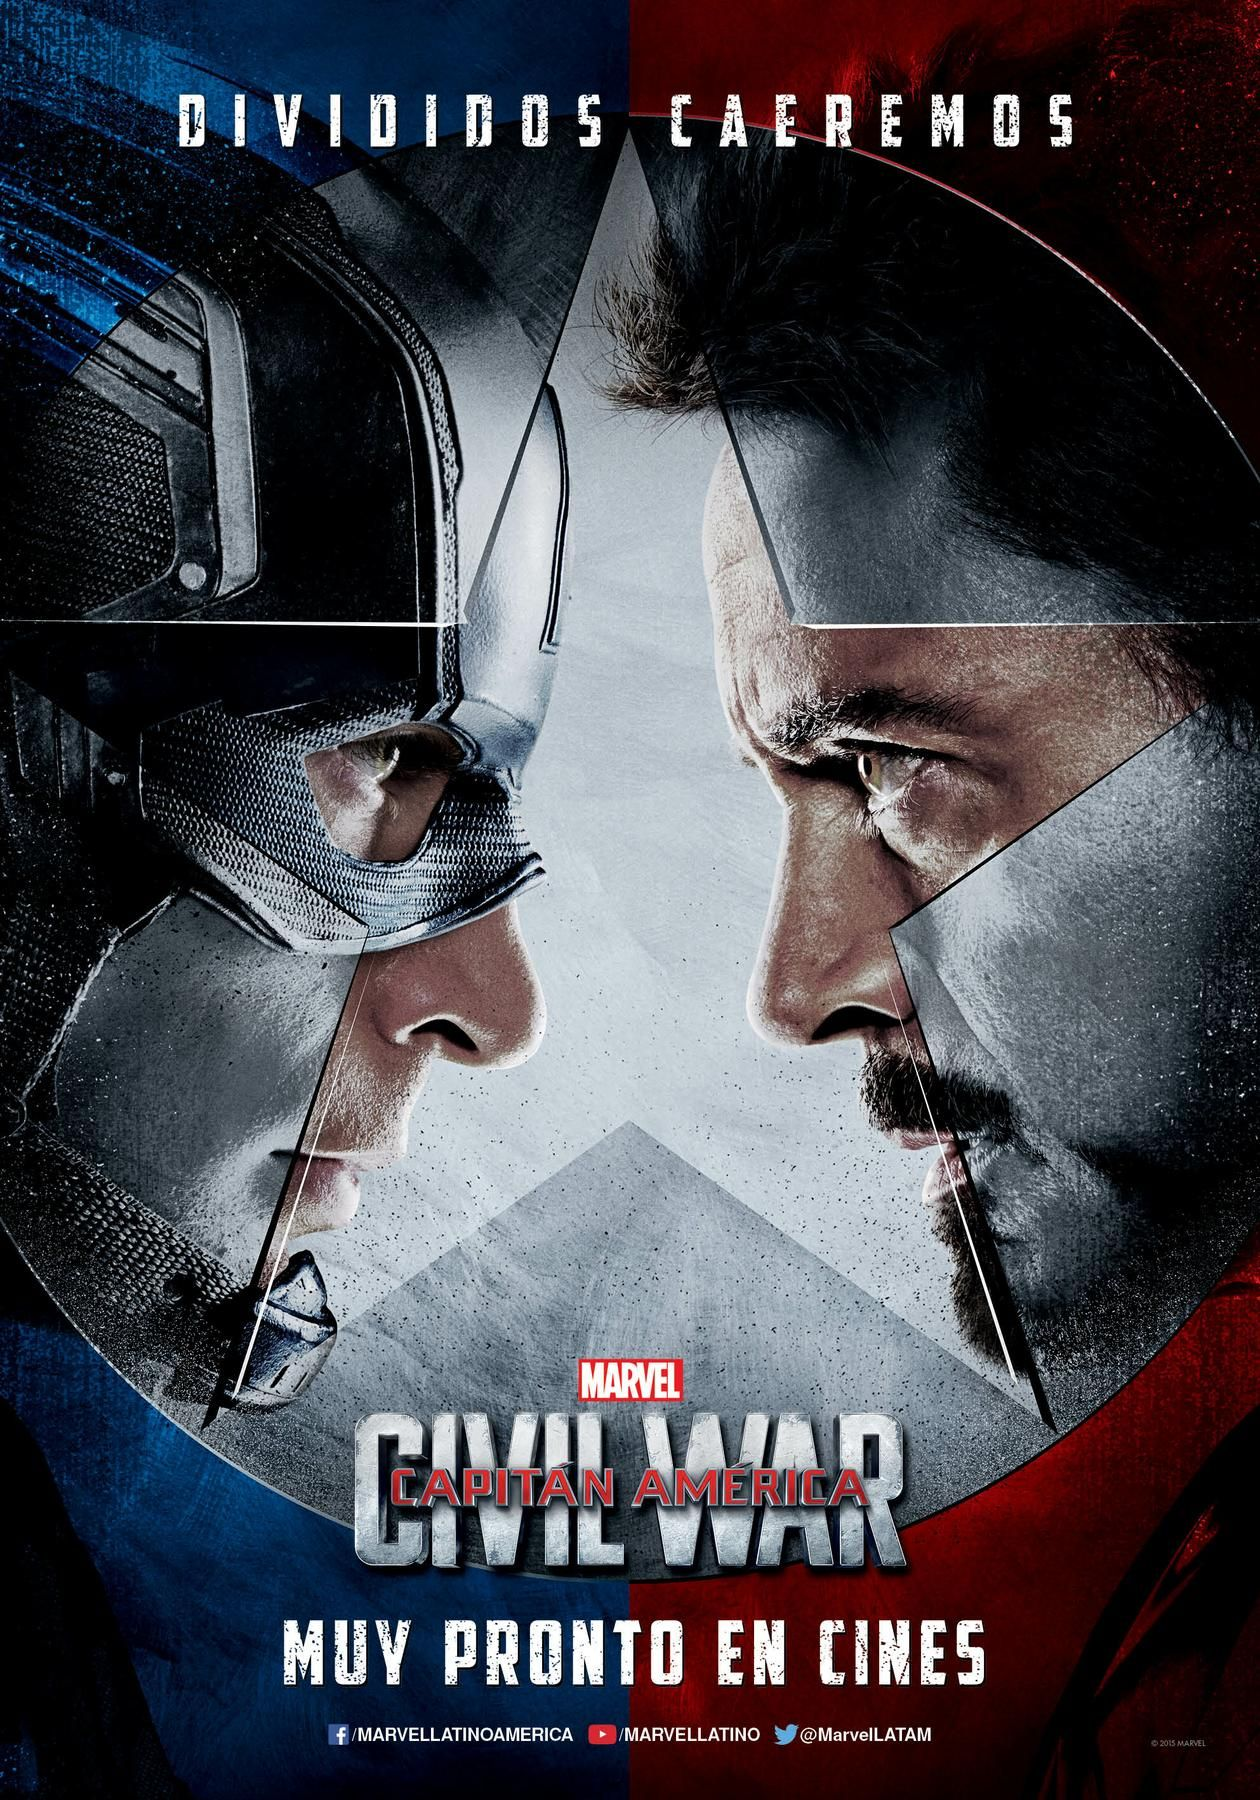 Captain America Civil Marvel Captain America Civil War Captain America Civil War Movie Captain America Civil